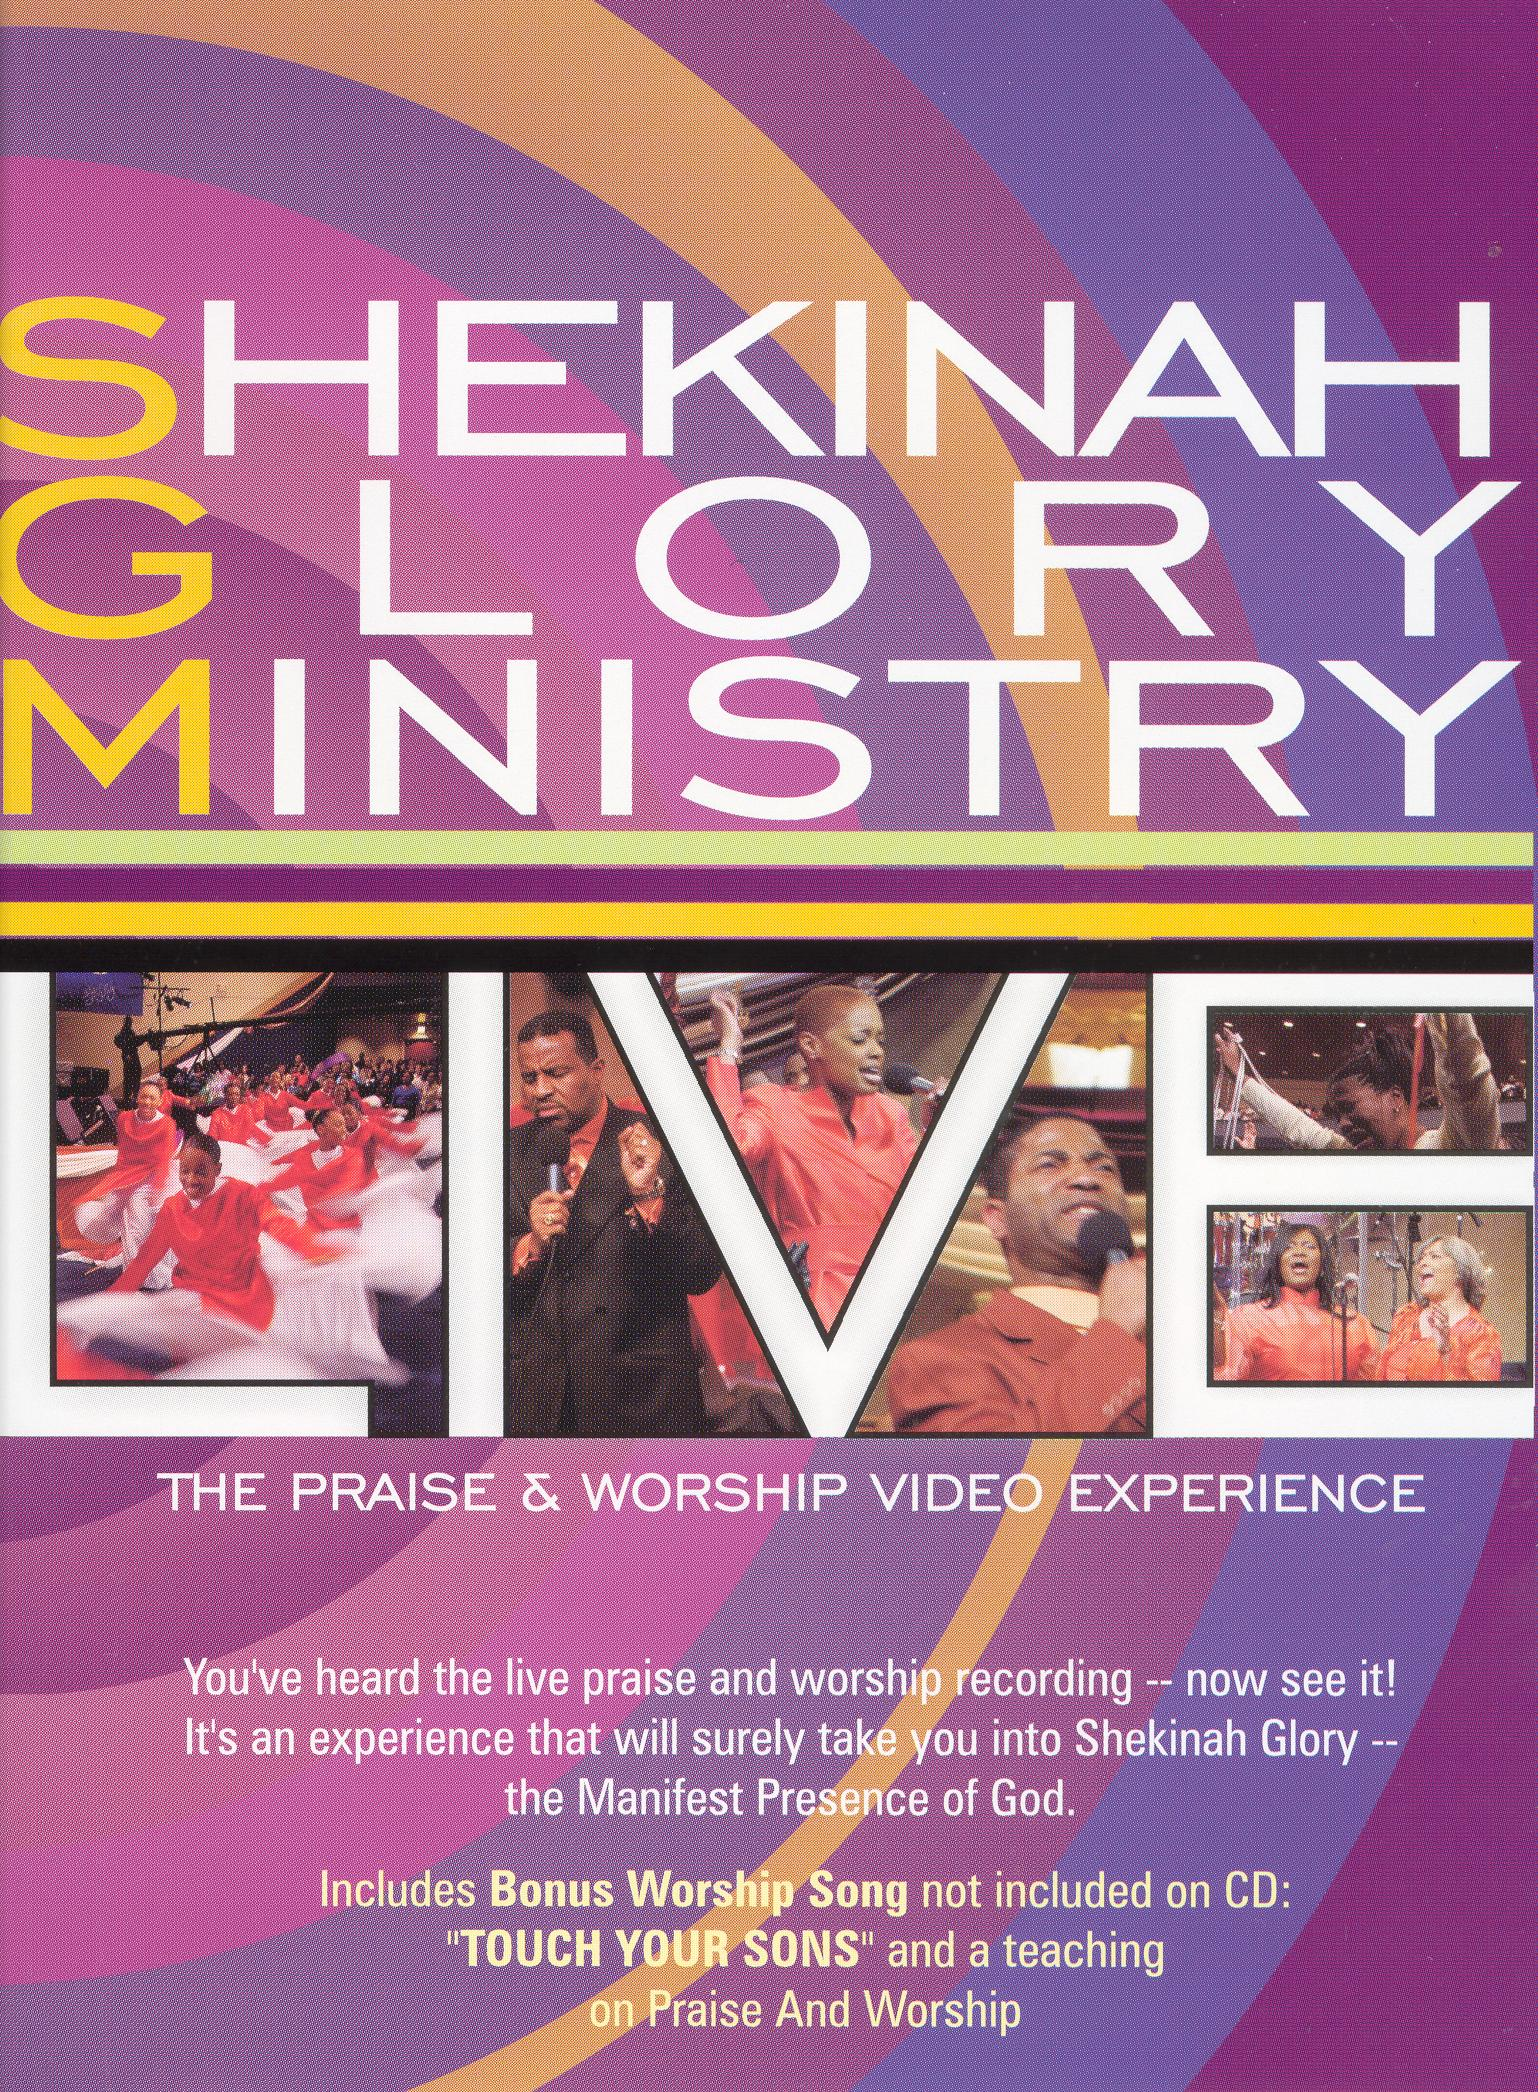 Shekinah Glory Ministry: Live